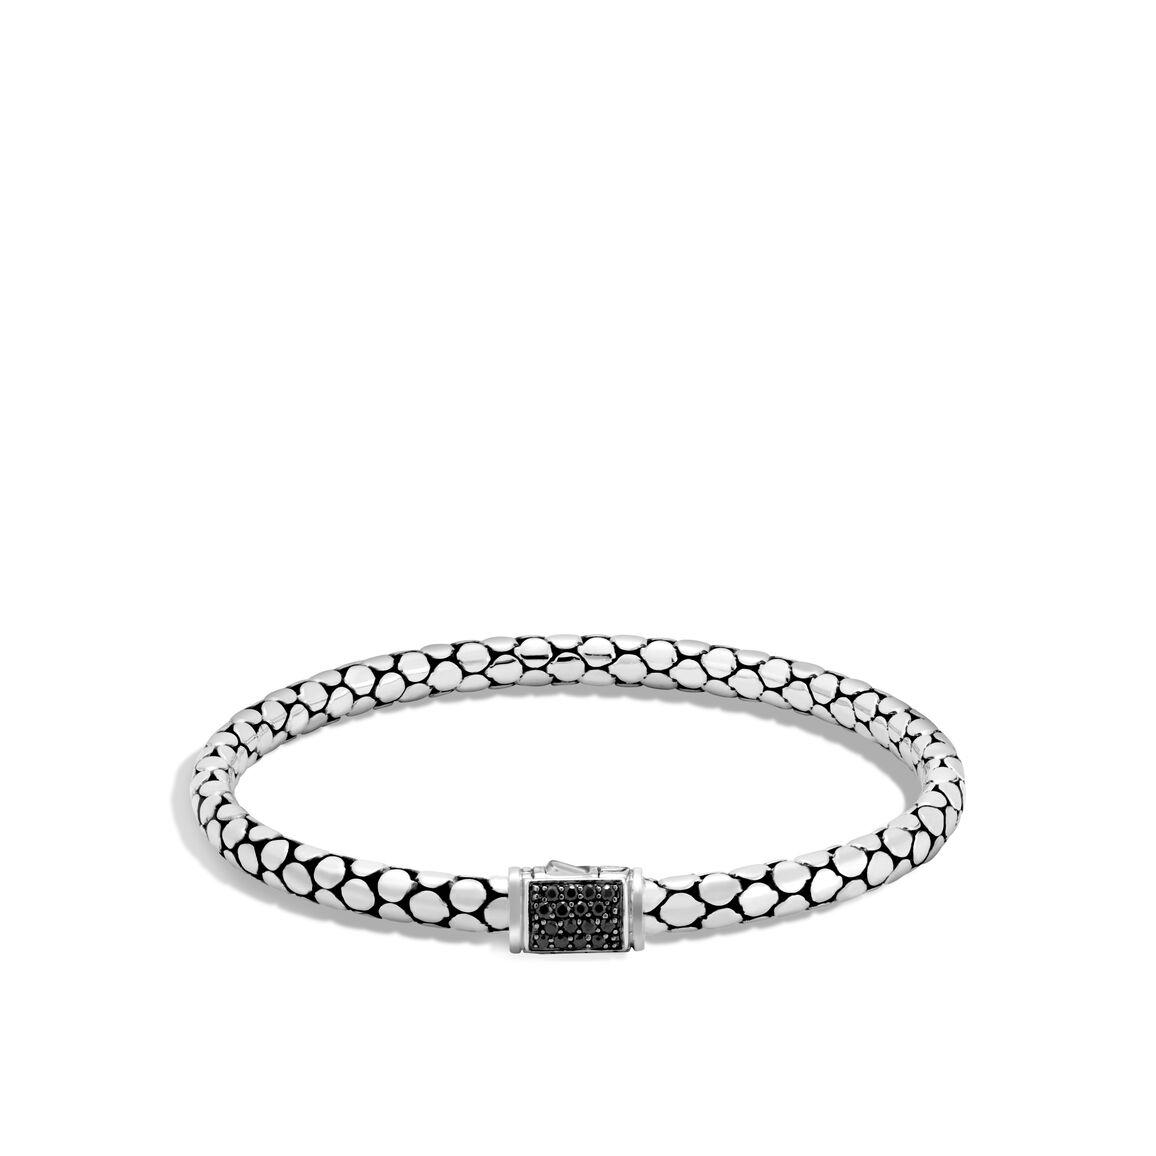 Dot 4.5MM  Bracelet in Silver with Gemstone